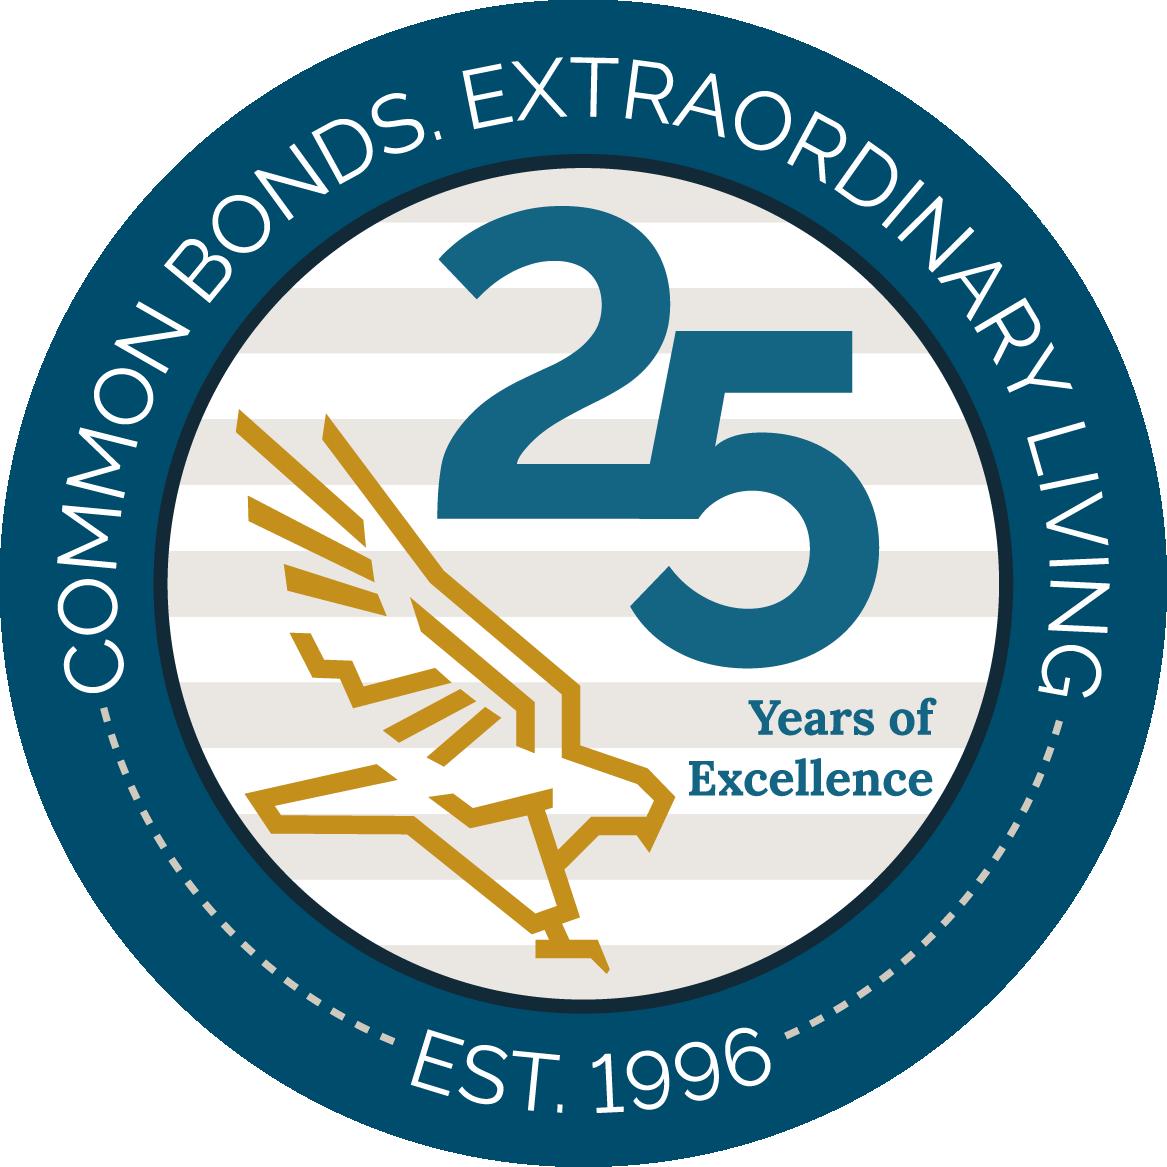 25years anniversary Logo of Falcons Land senior living, Virginia